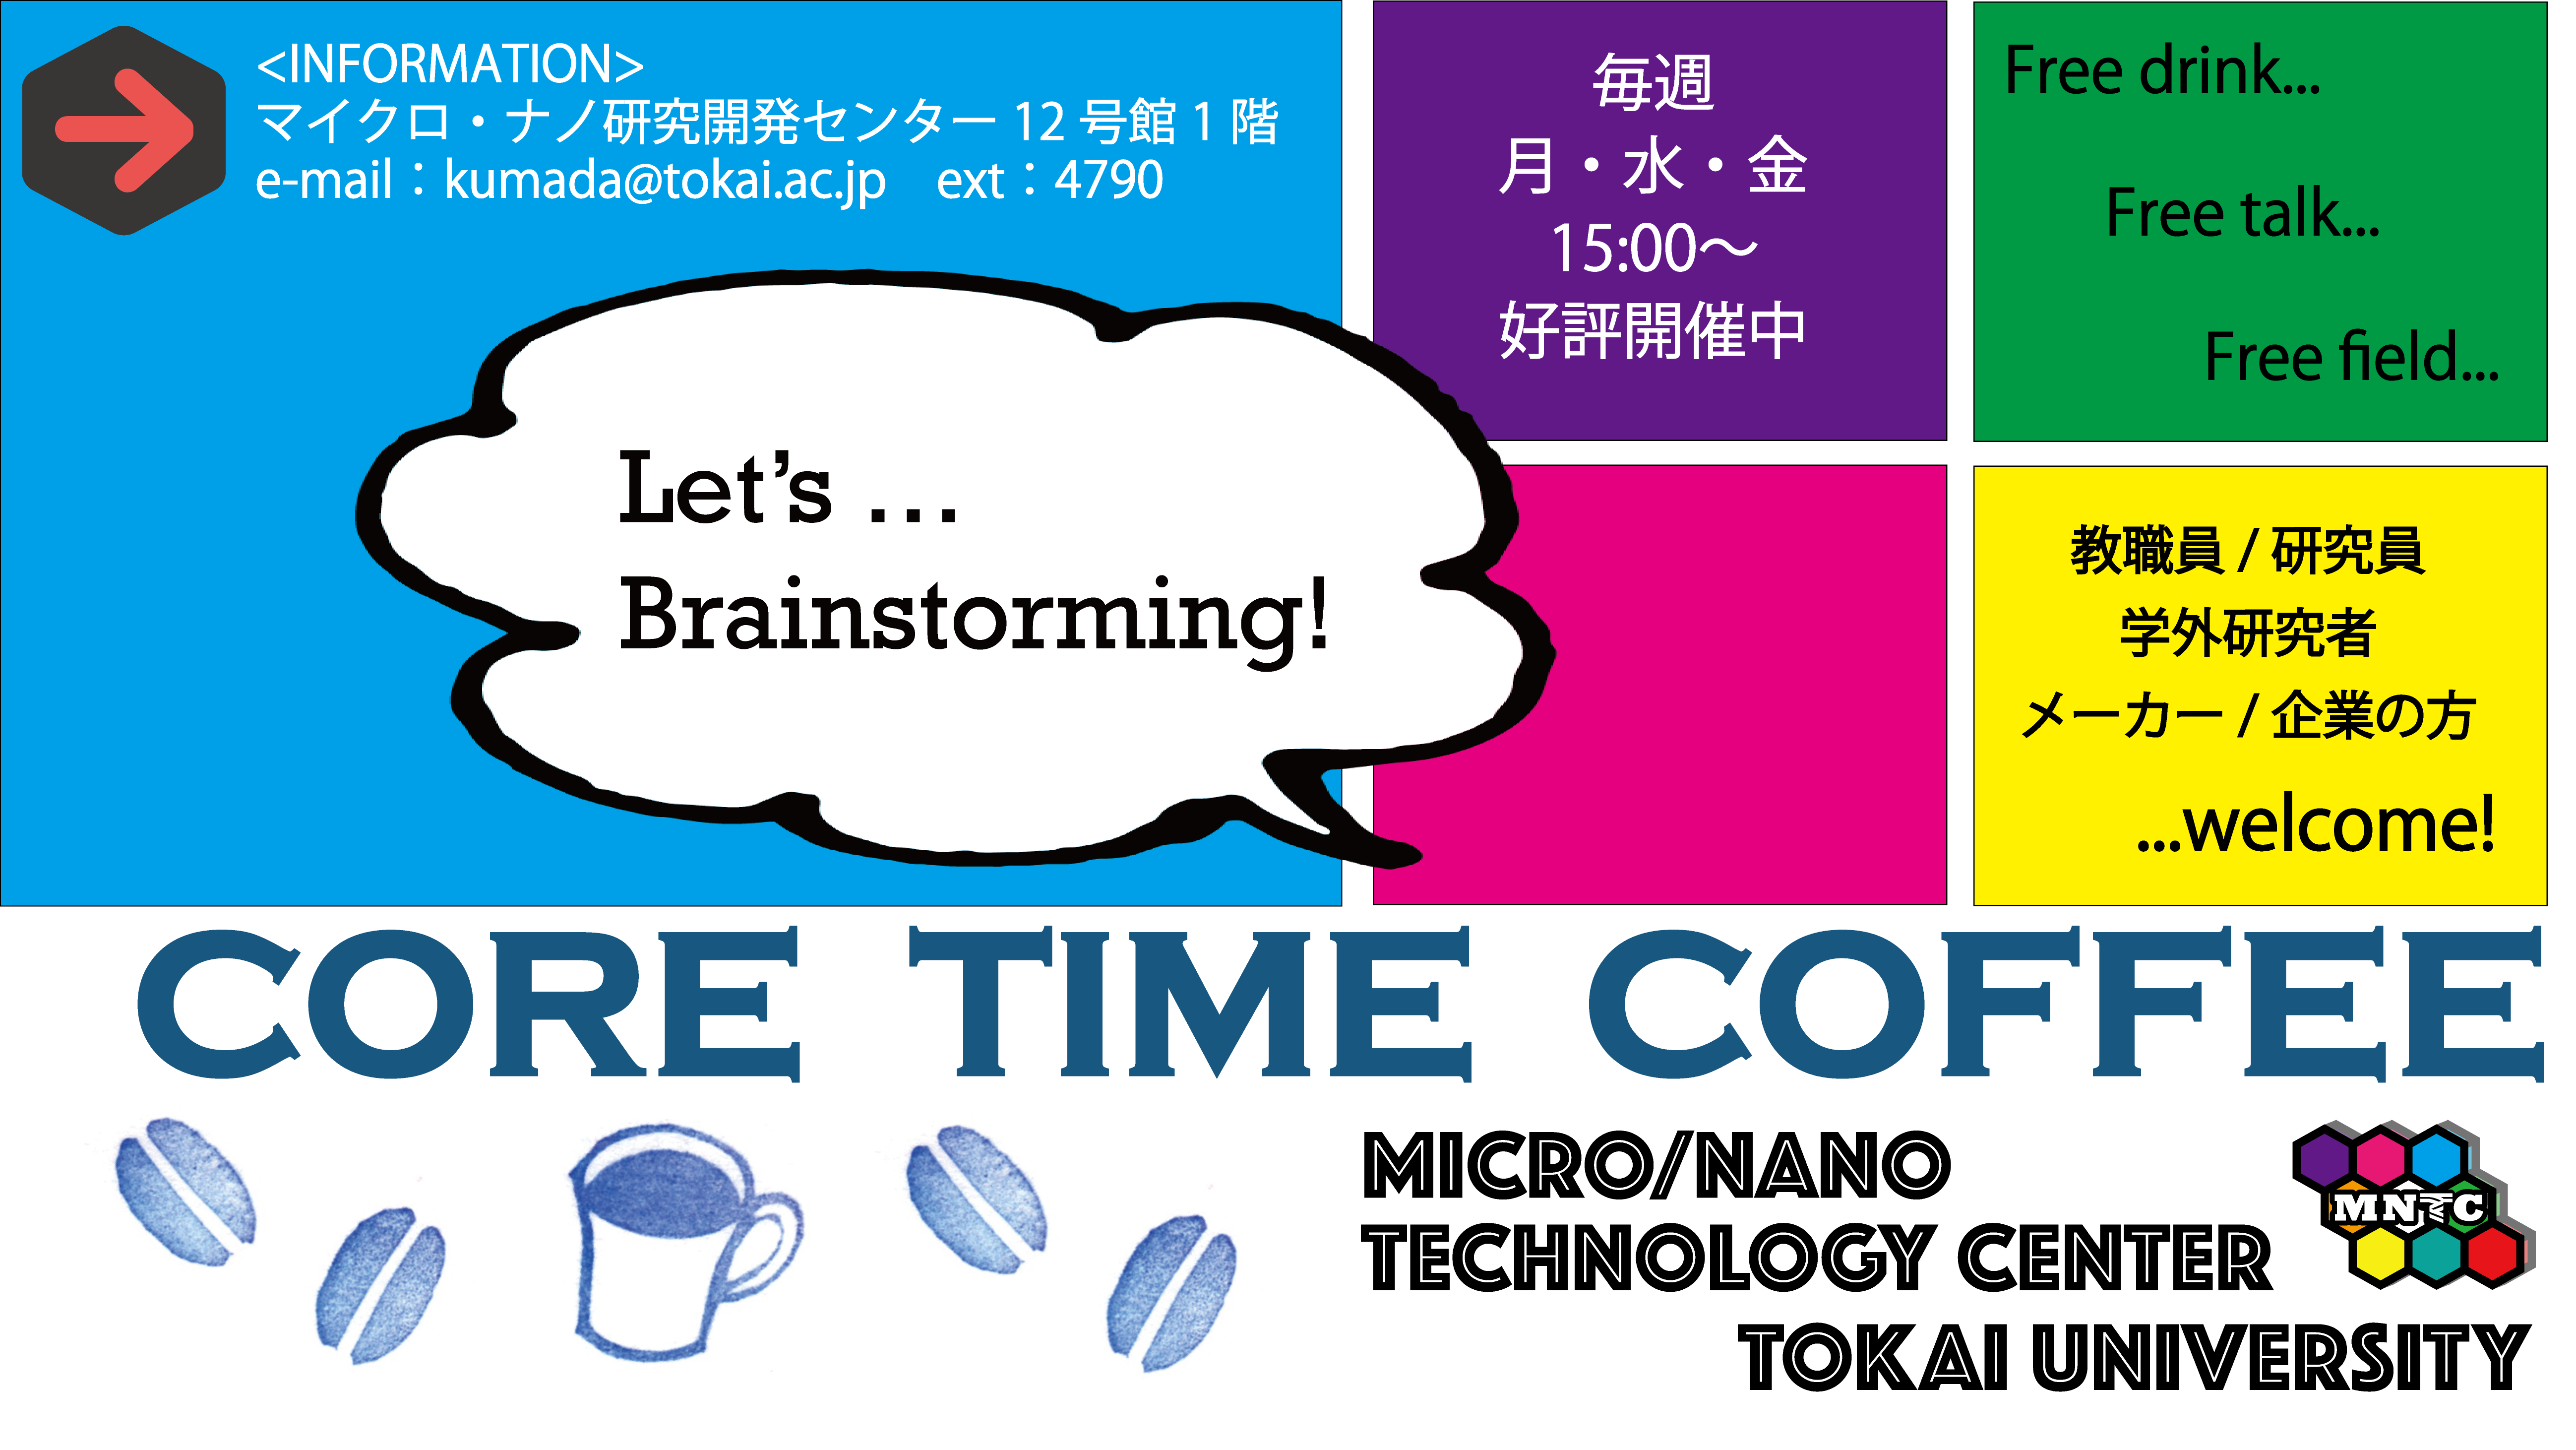 CORE TIME COFFEE